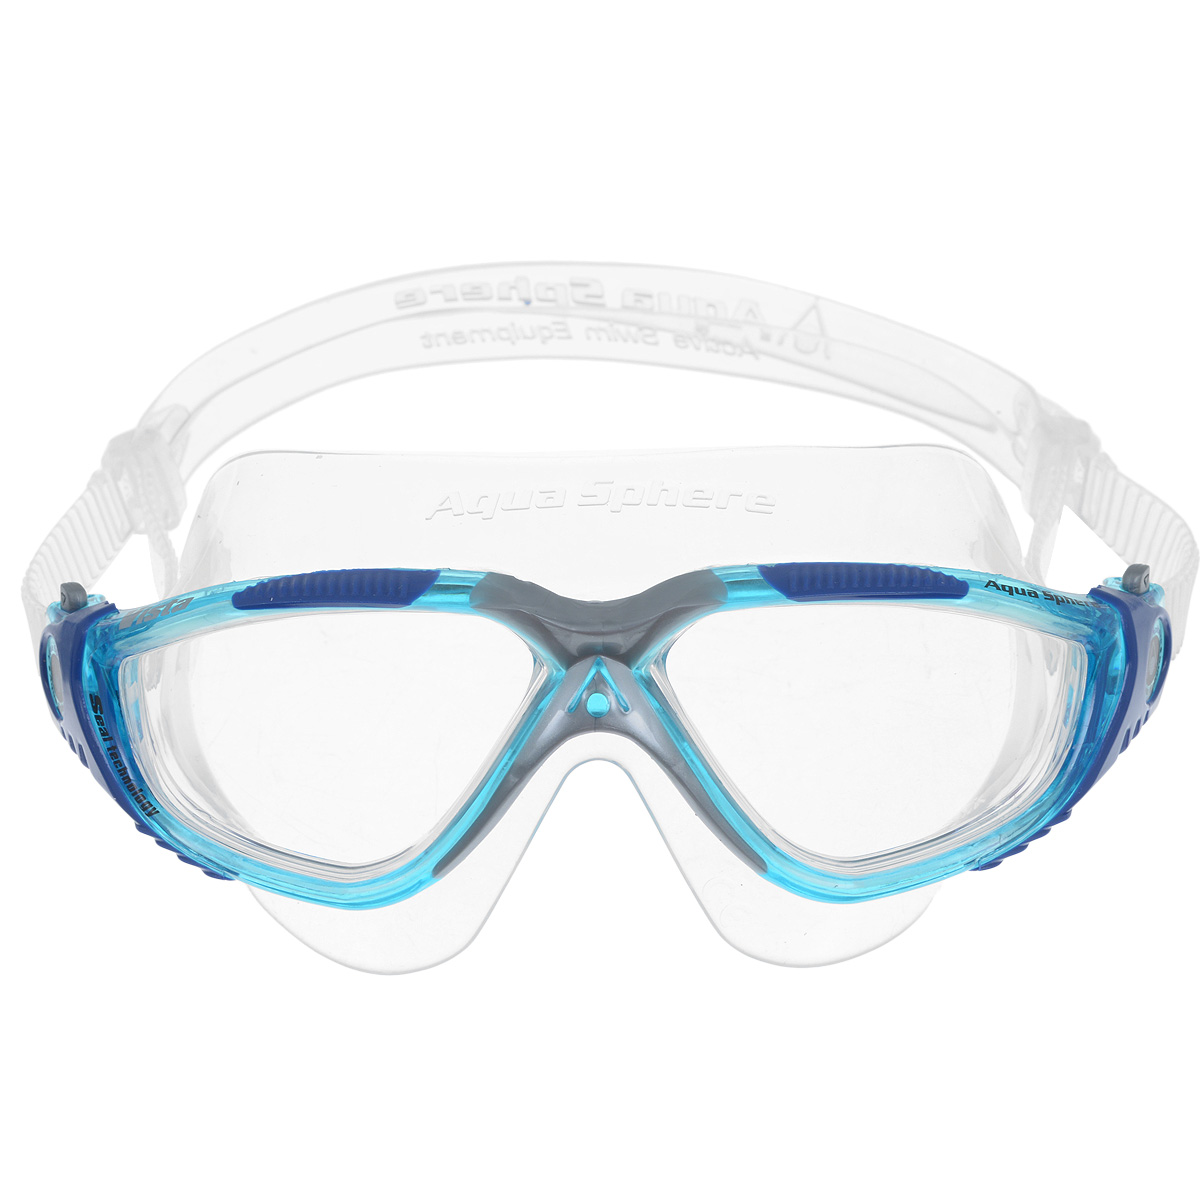 Очки для плавания Aqua Sphere Vista, цвет: аквамарин, синий цена